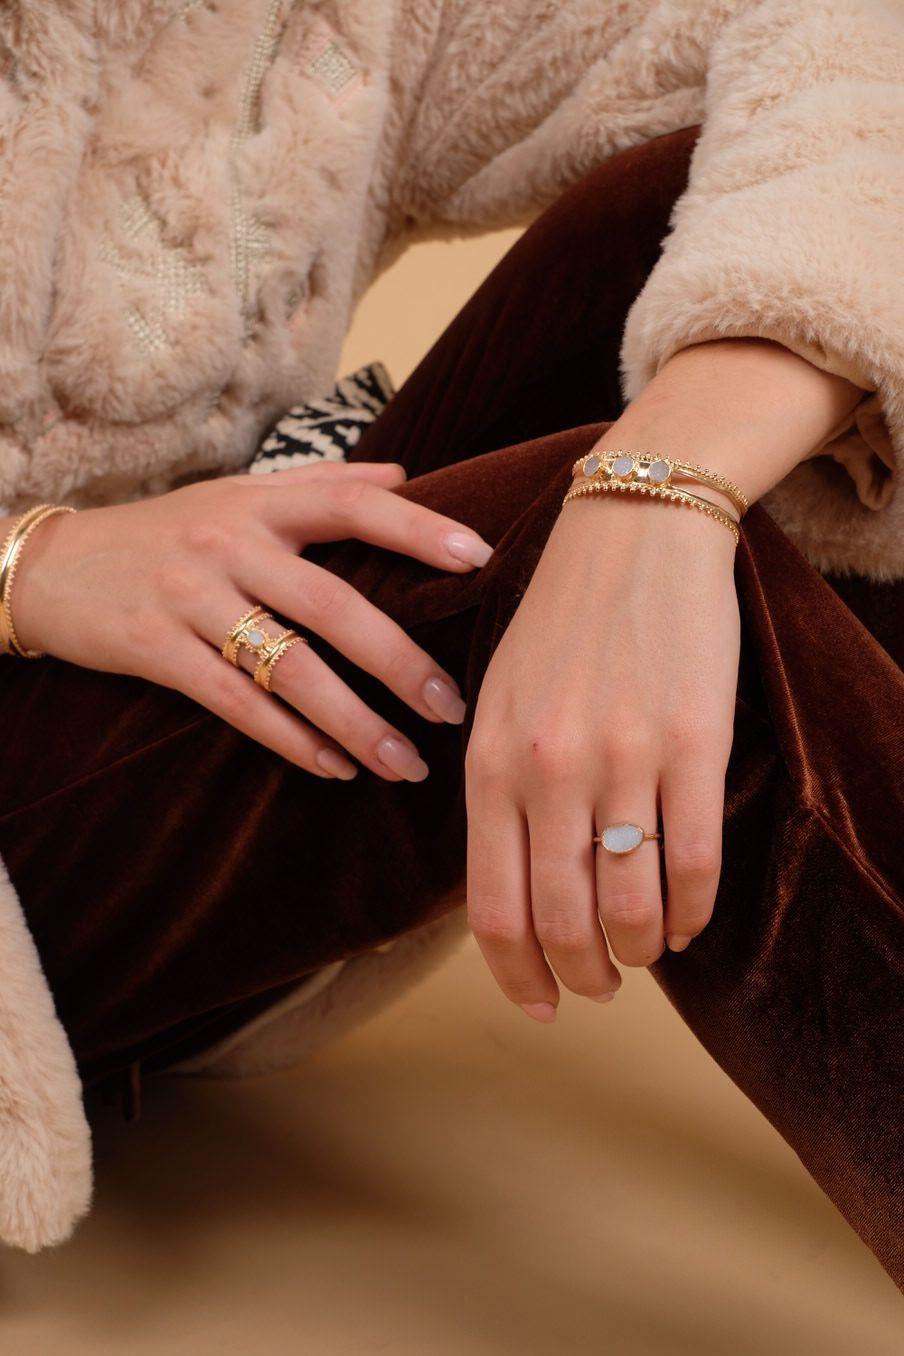 bohemian chic vintage bracelet woman milera ice